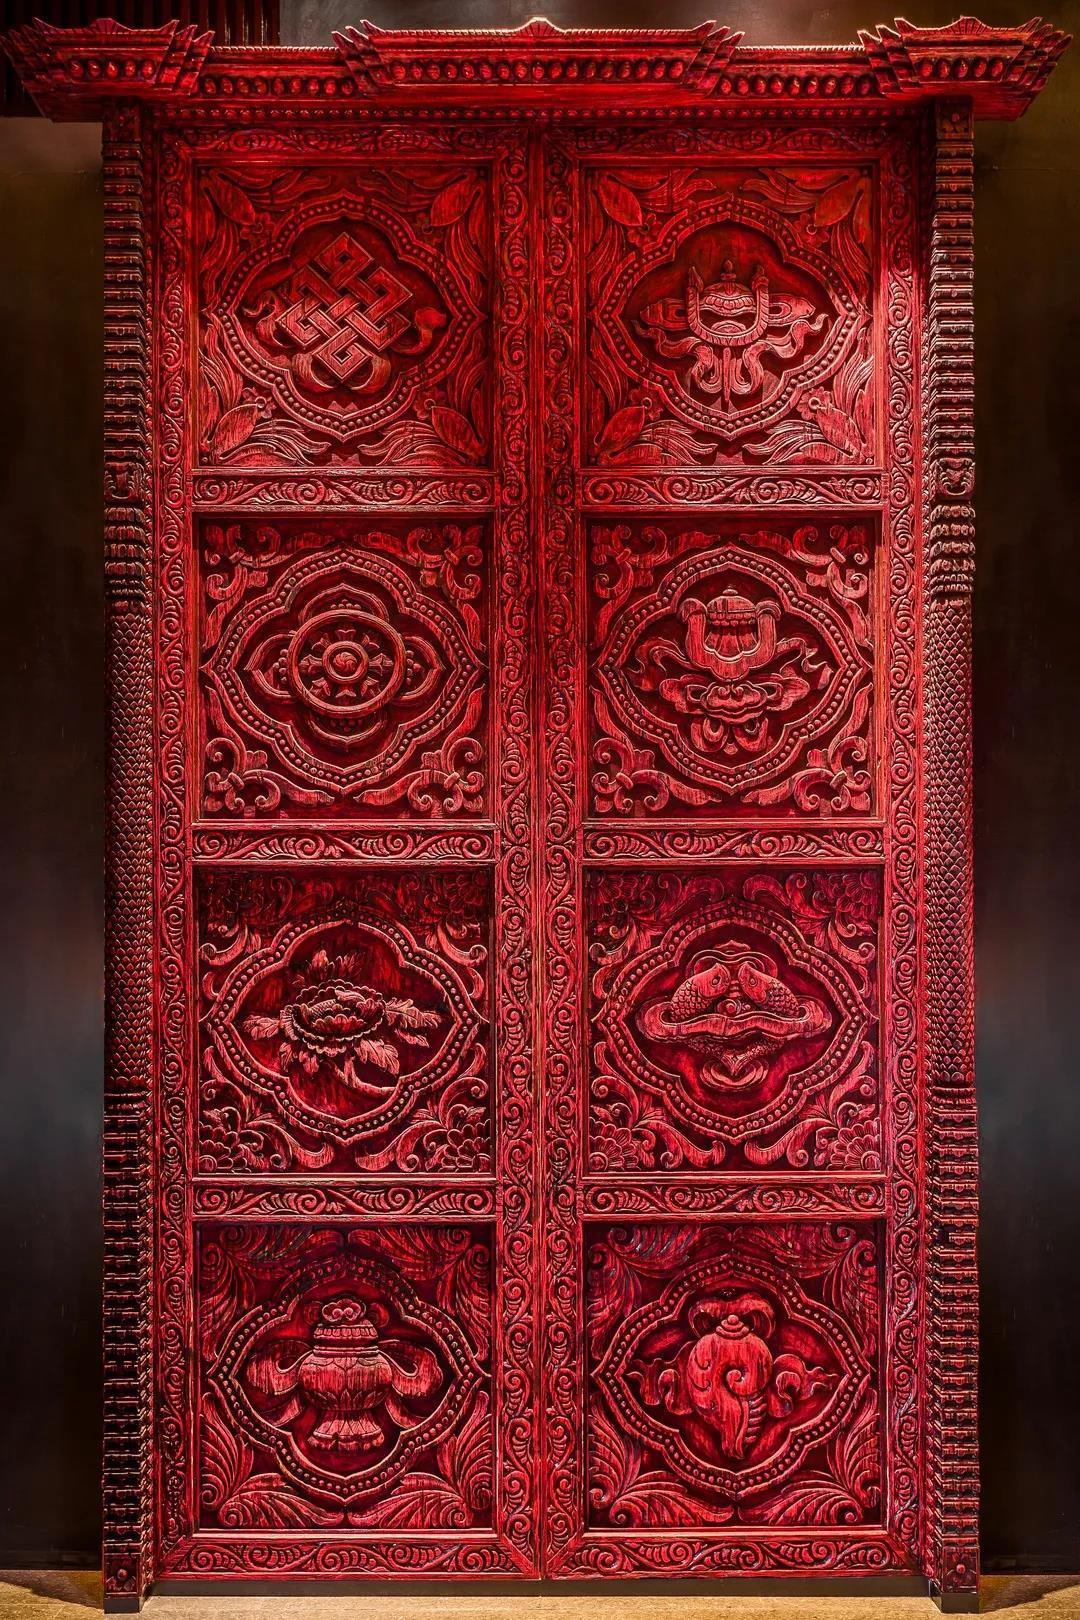 The eight auspicious symbols in Tibetan Buddhism